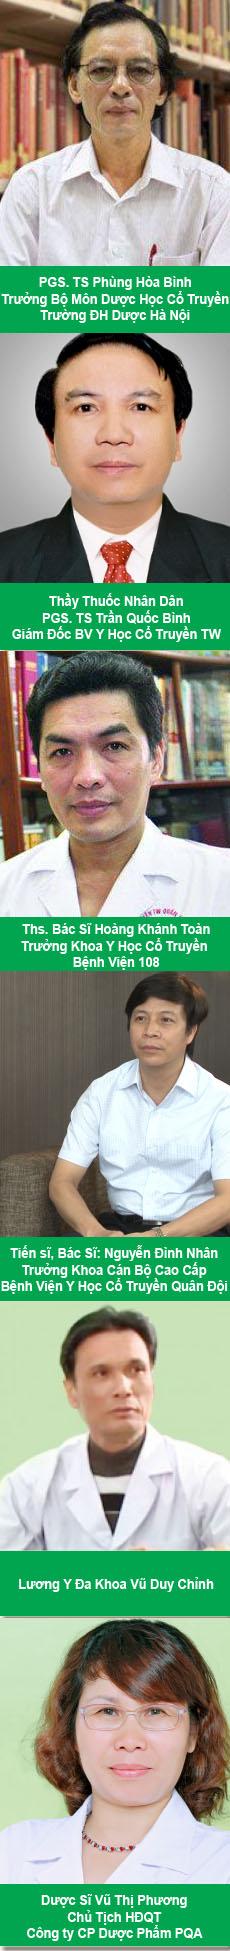 hoi-dong-khoa-hoc-duoc-pham-pqa